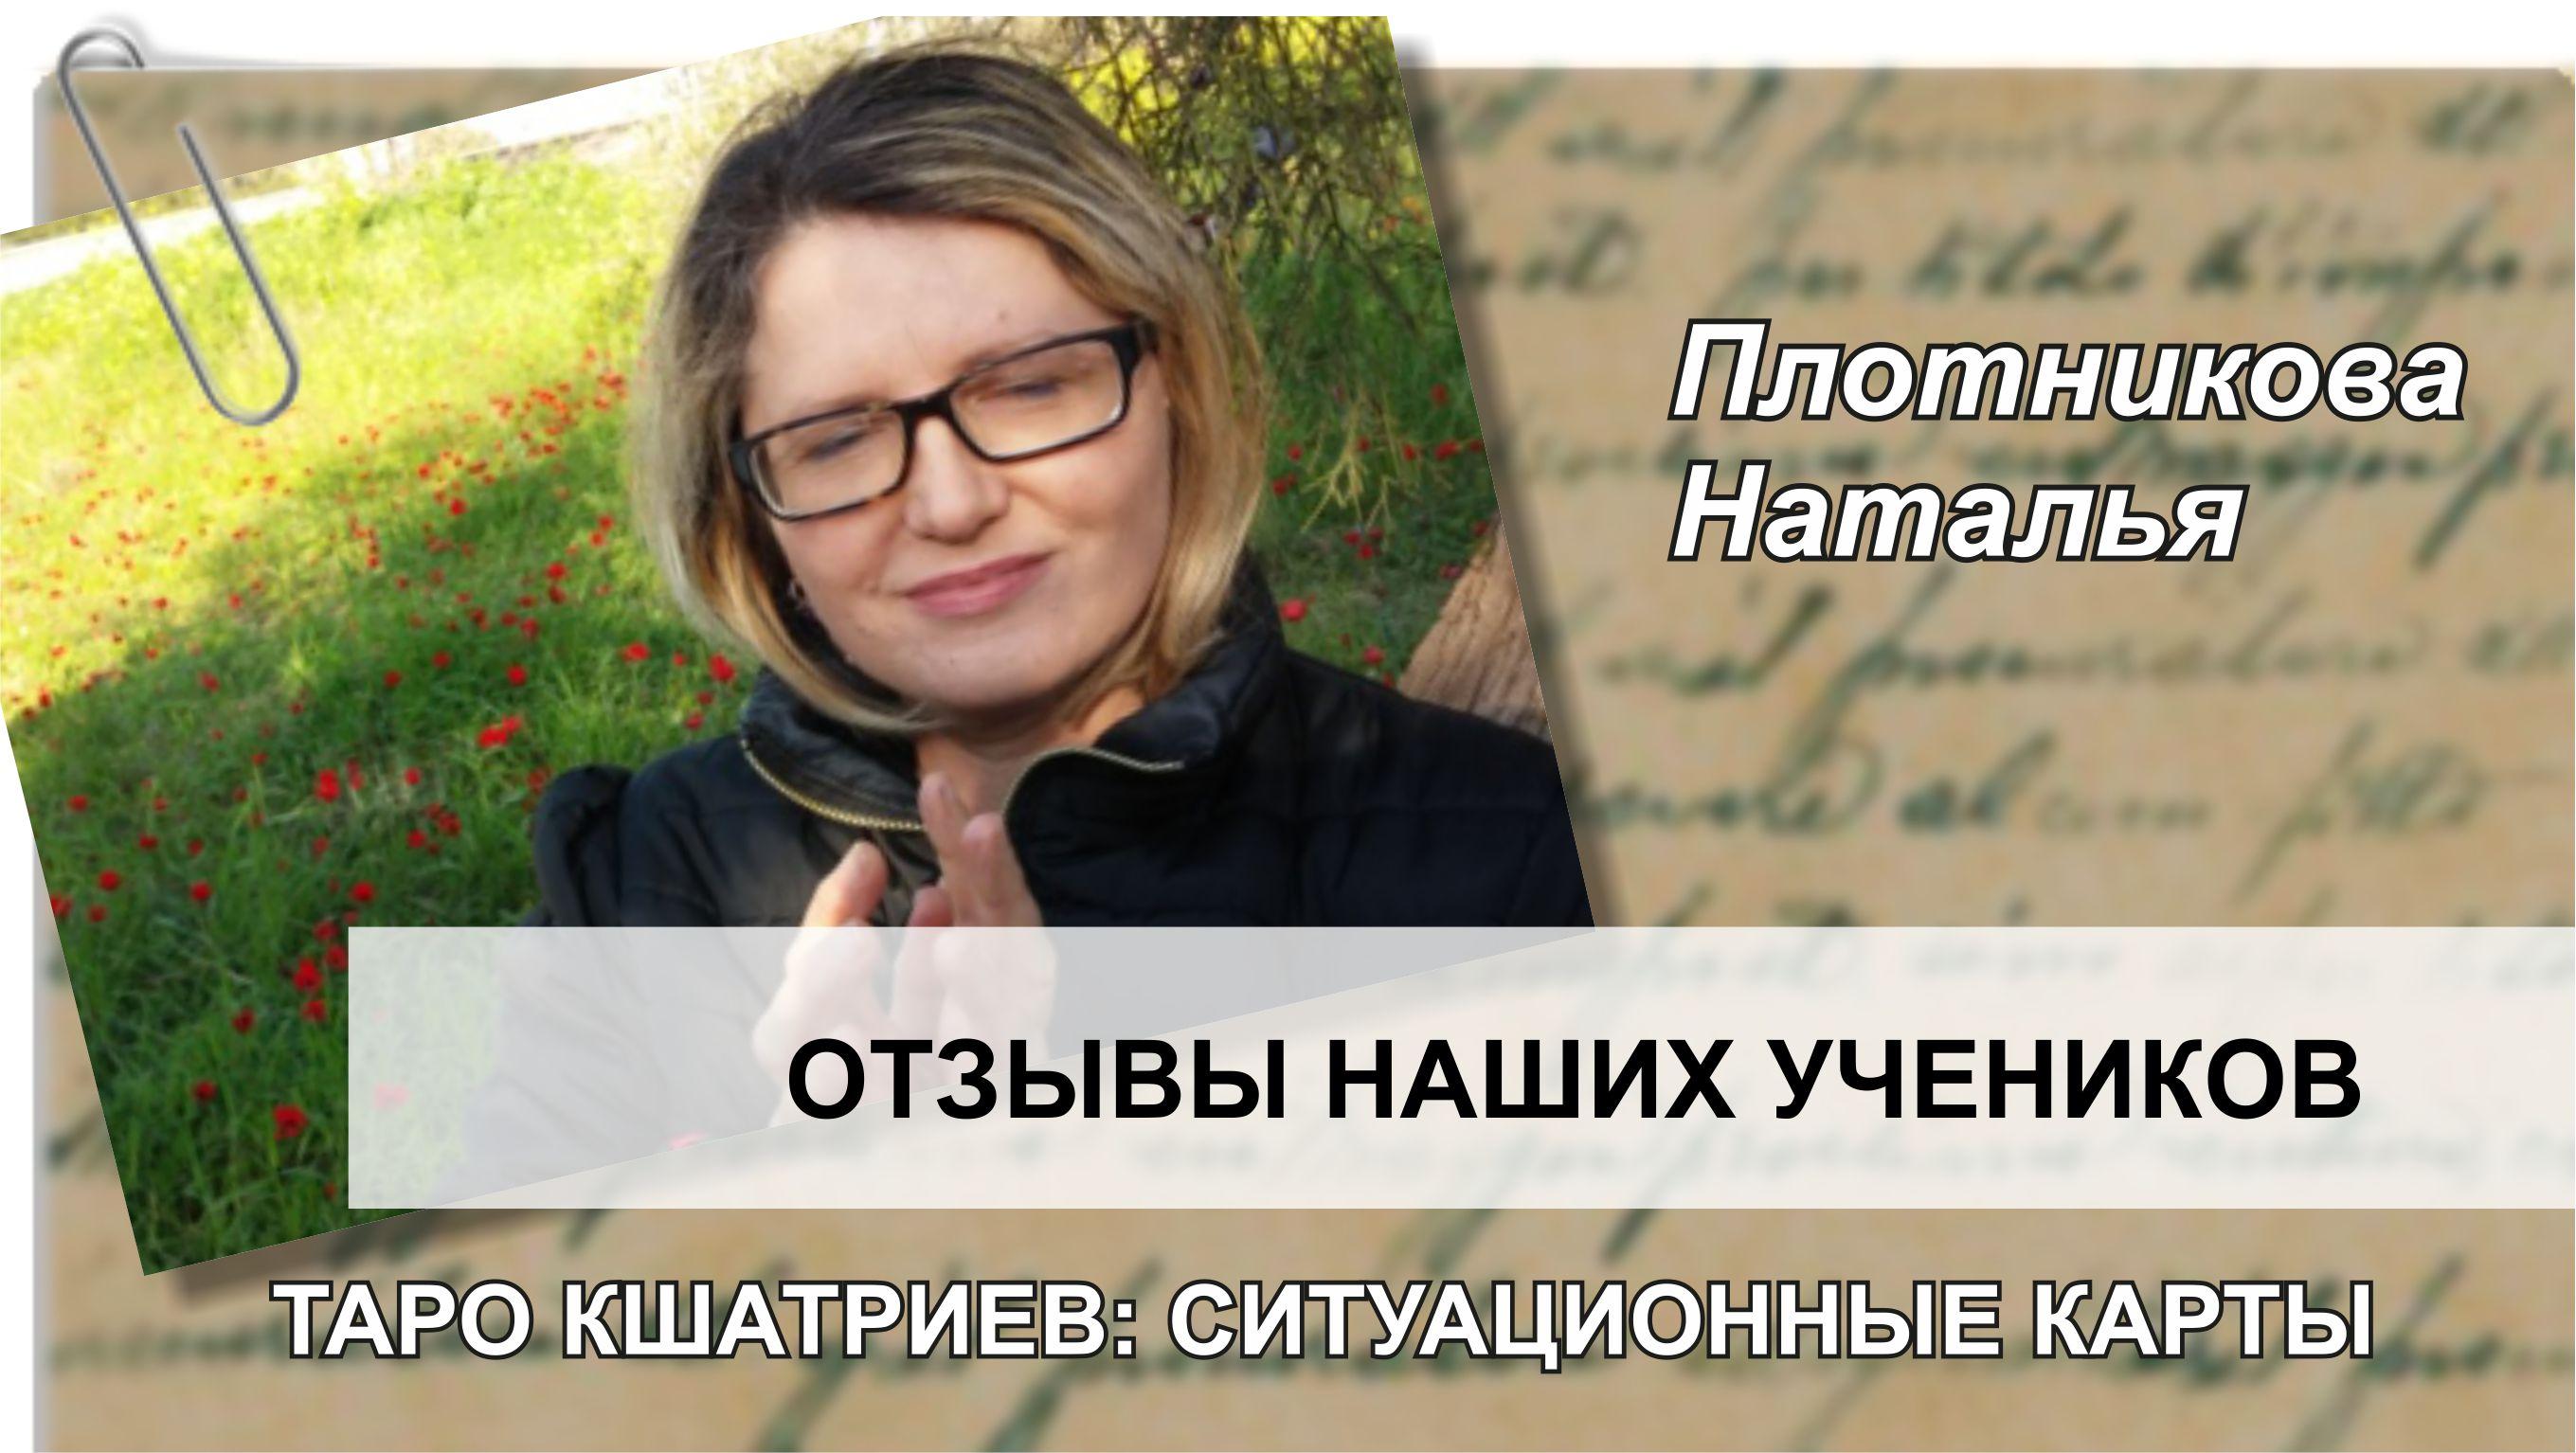 Плотникова Наталья отзыв Таро Кшатриев